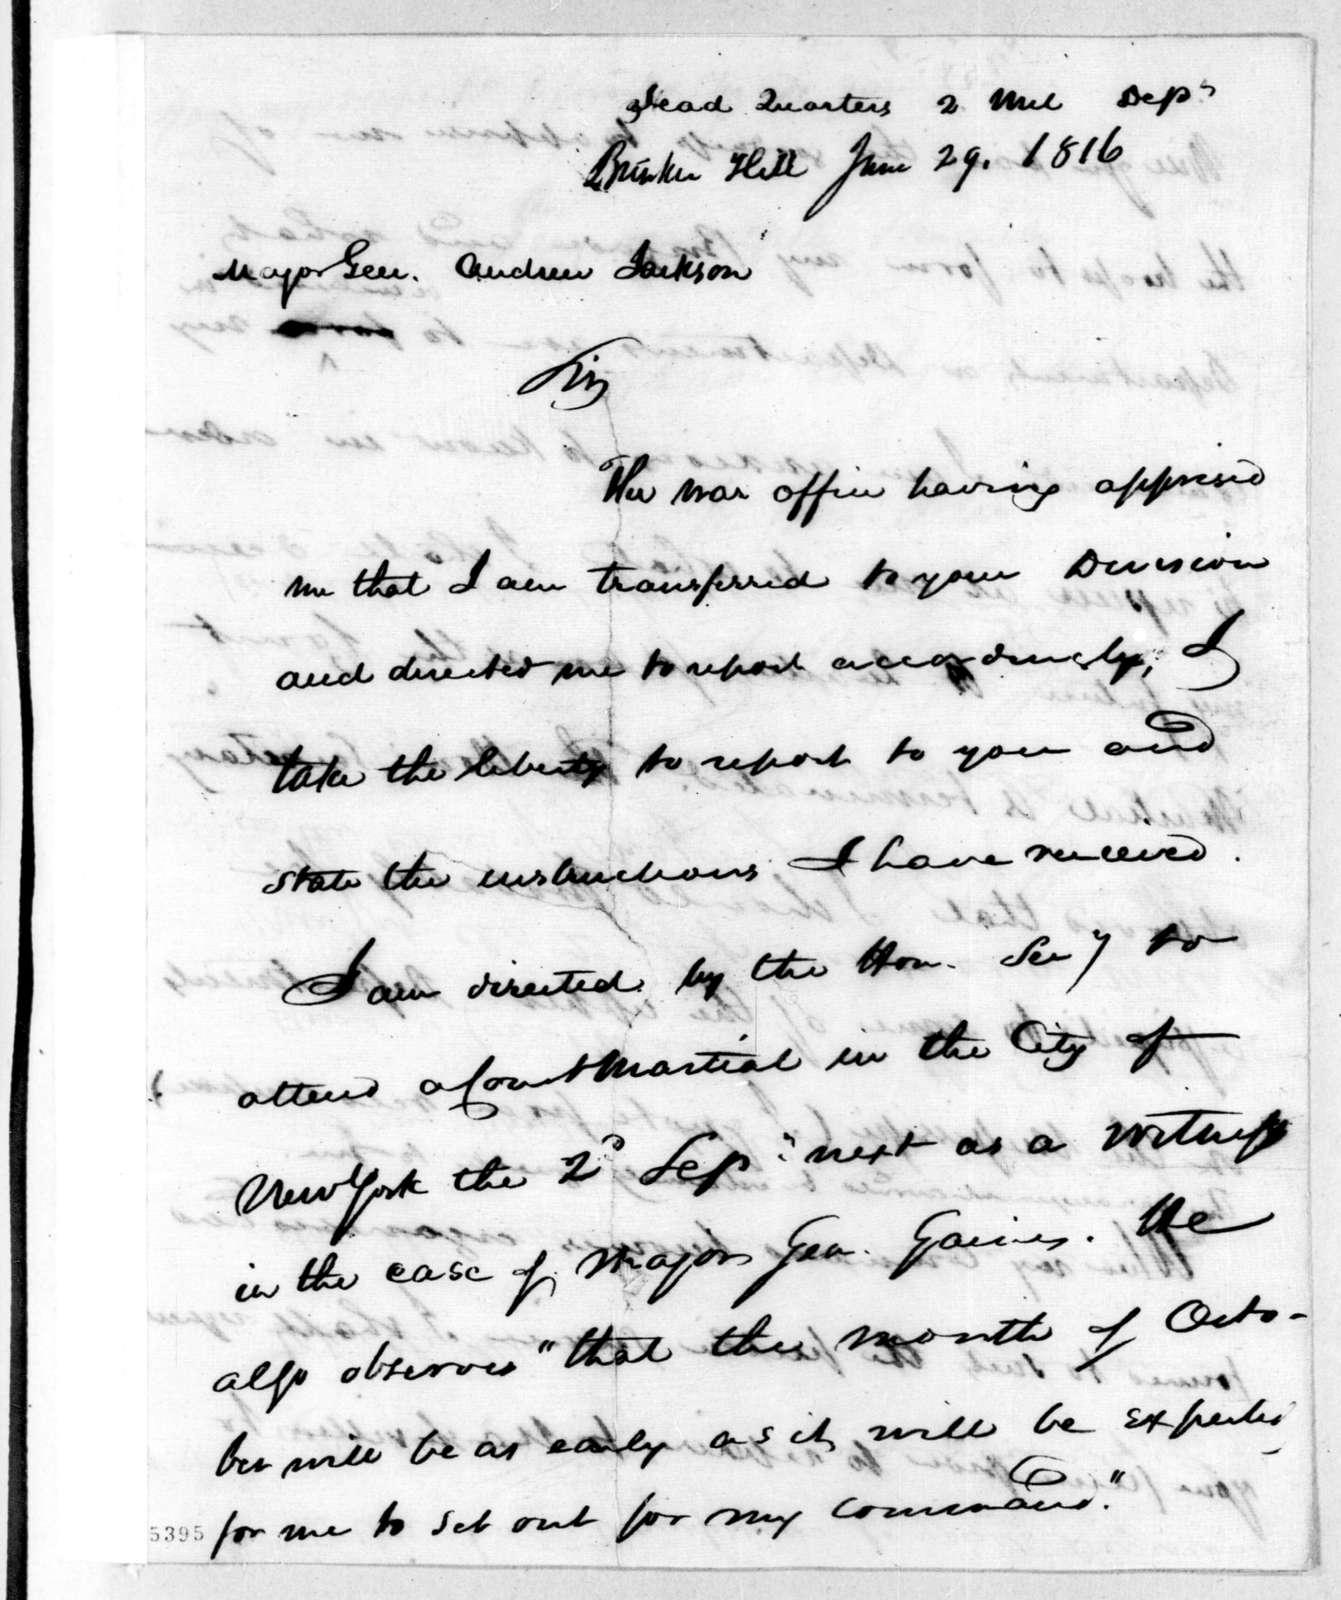 Eleazar Wheelock Ripley to Andrew Jackson, June 29, 1816